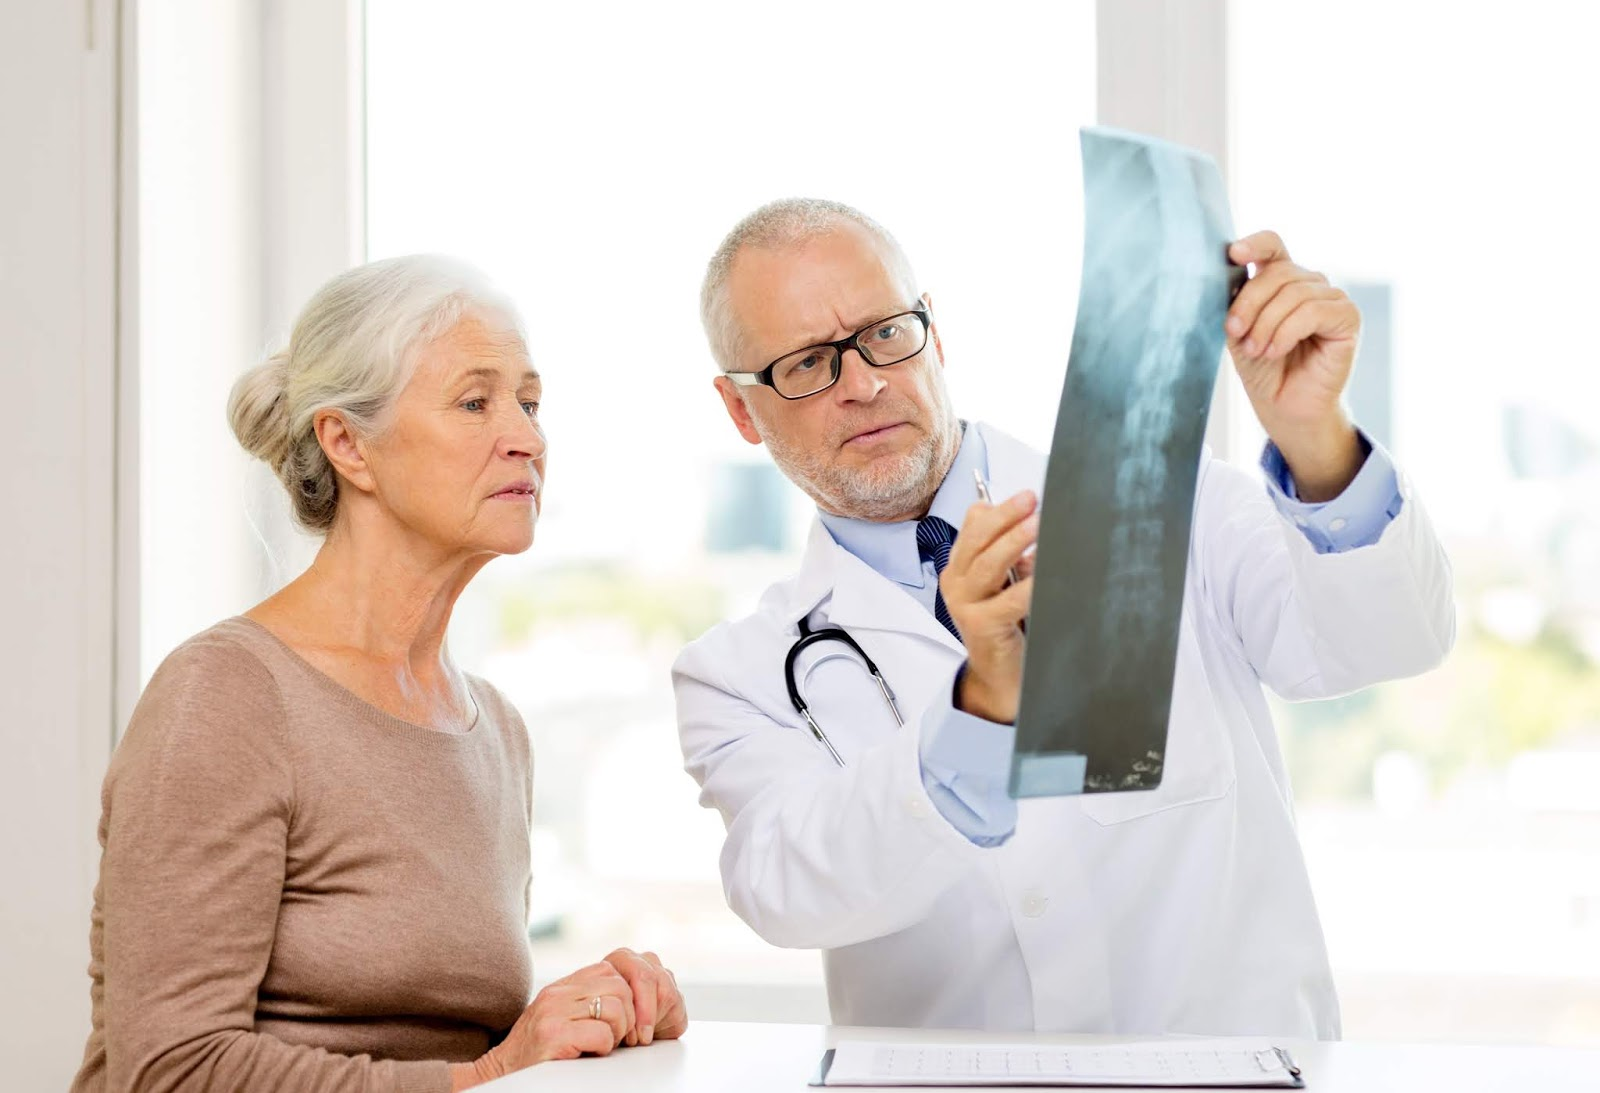 Cegah, gejala dan penyebab Osteoporosis